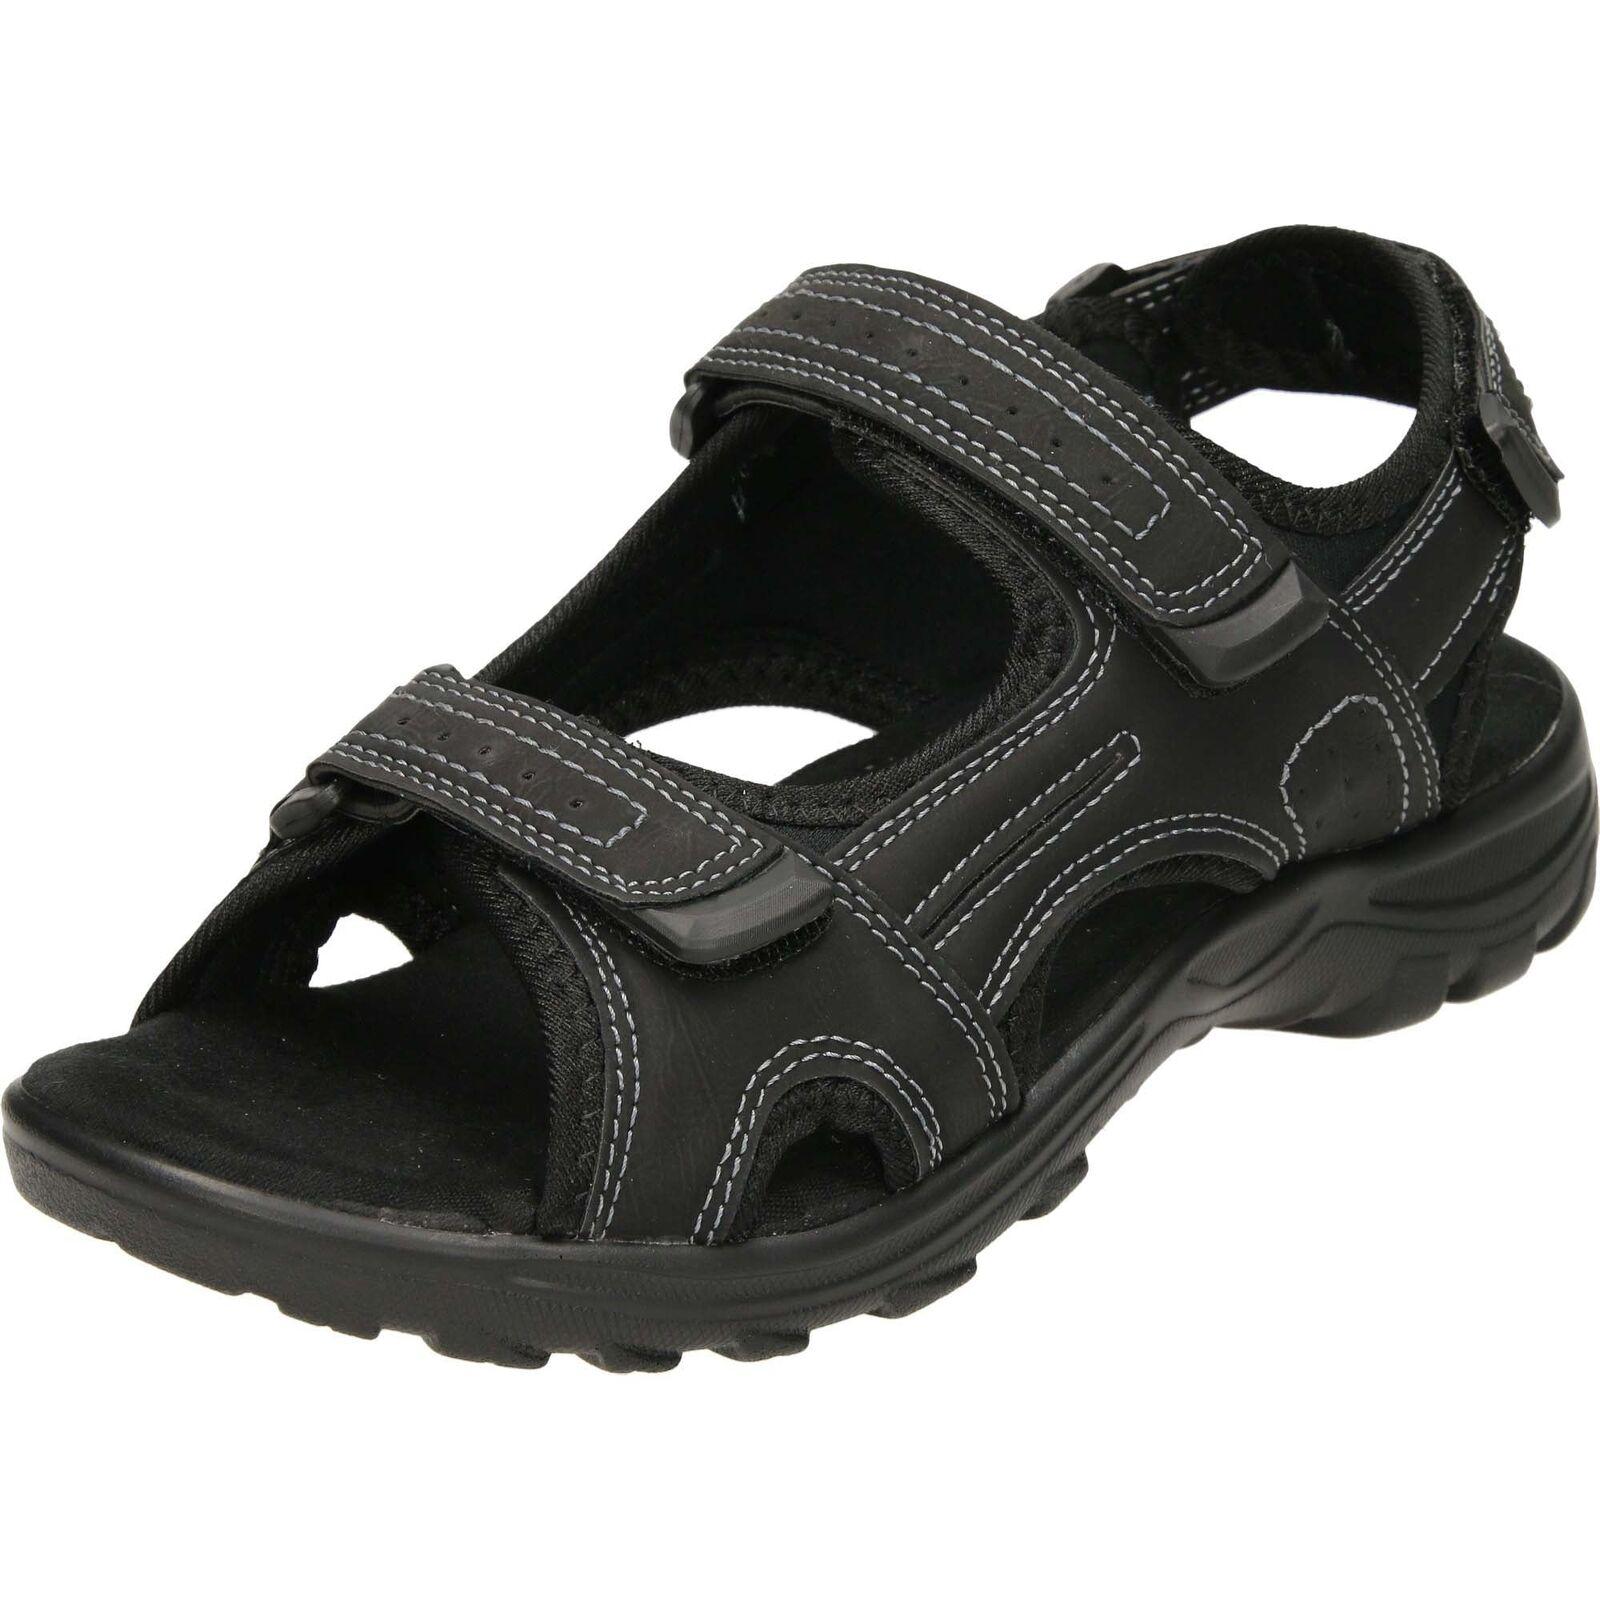 Dr Keller Touch Fastening Walking Outdoor Sandals Open Toe Summer Beach shoes